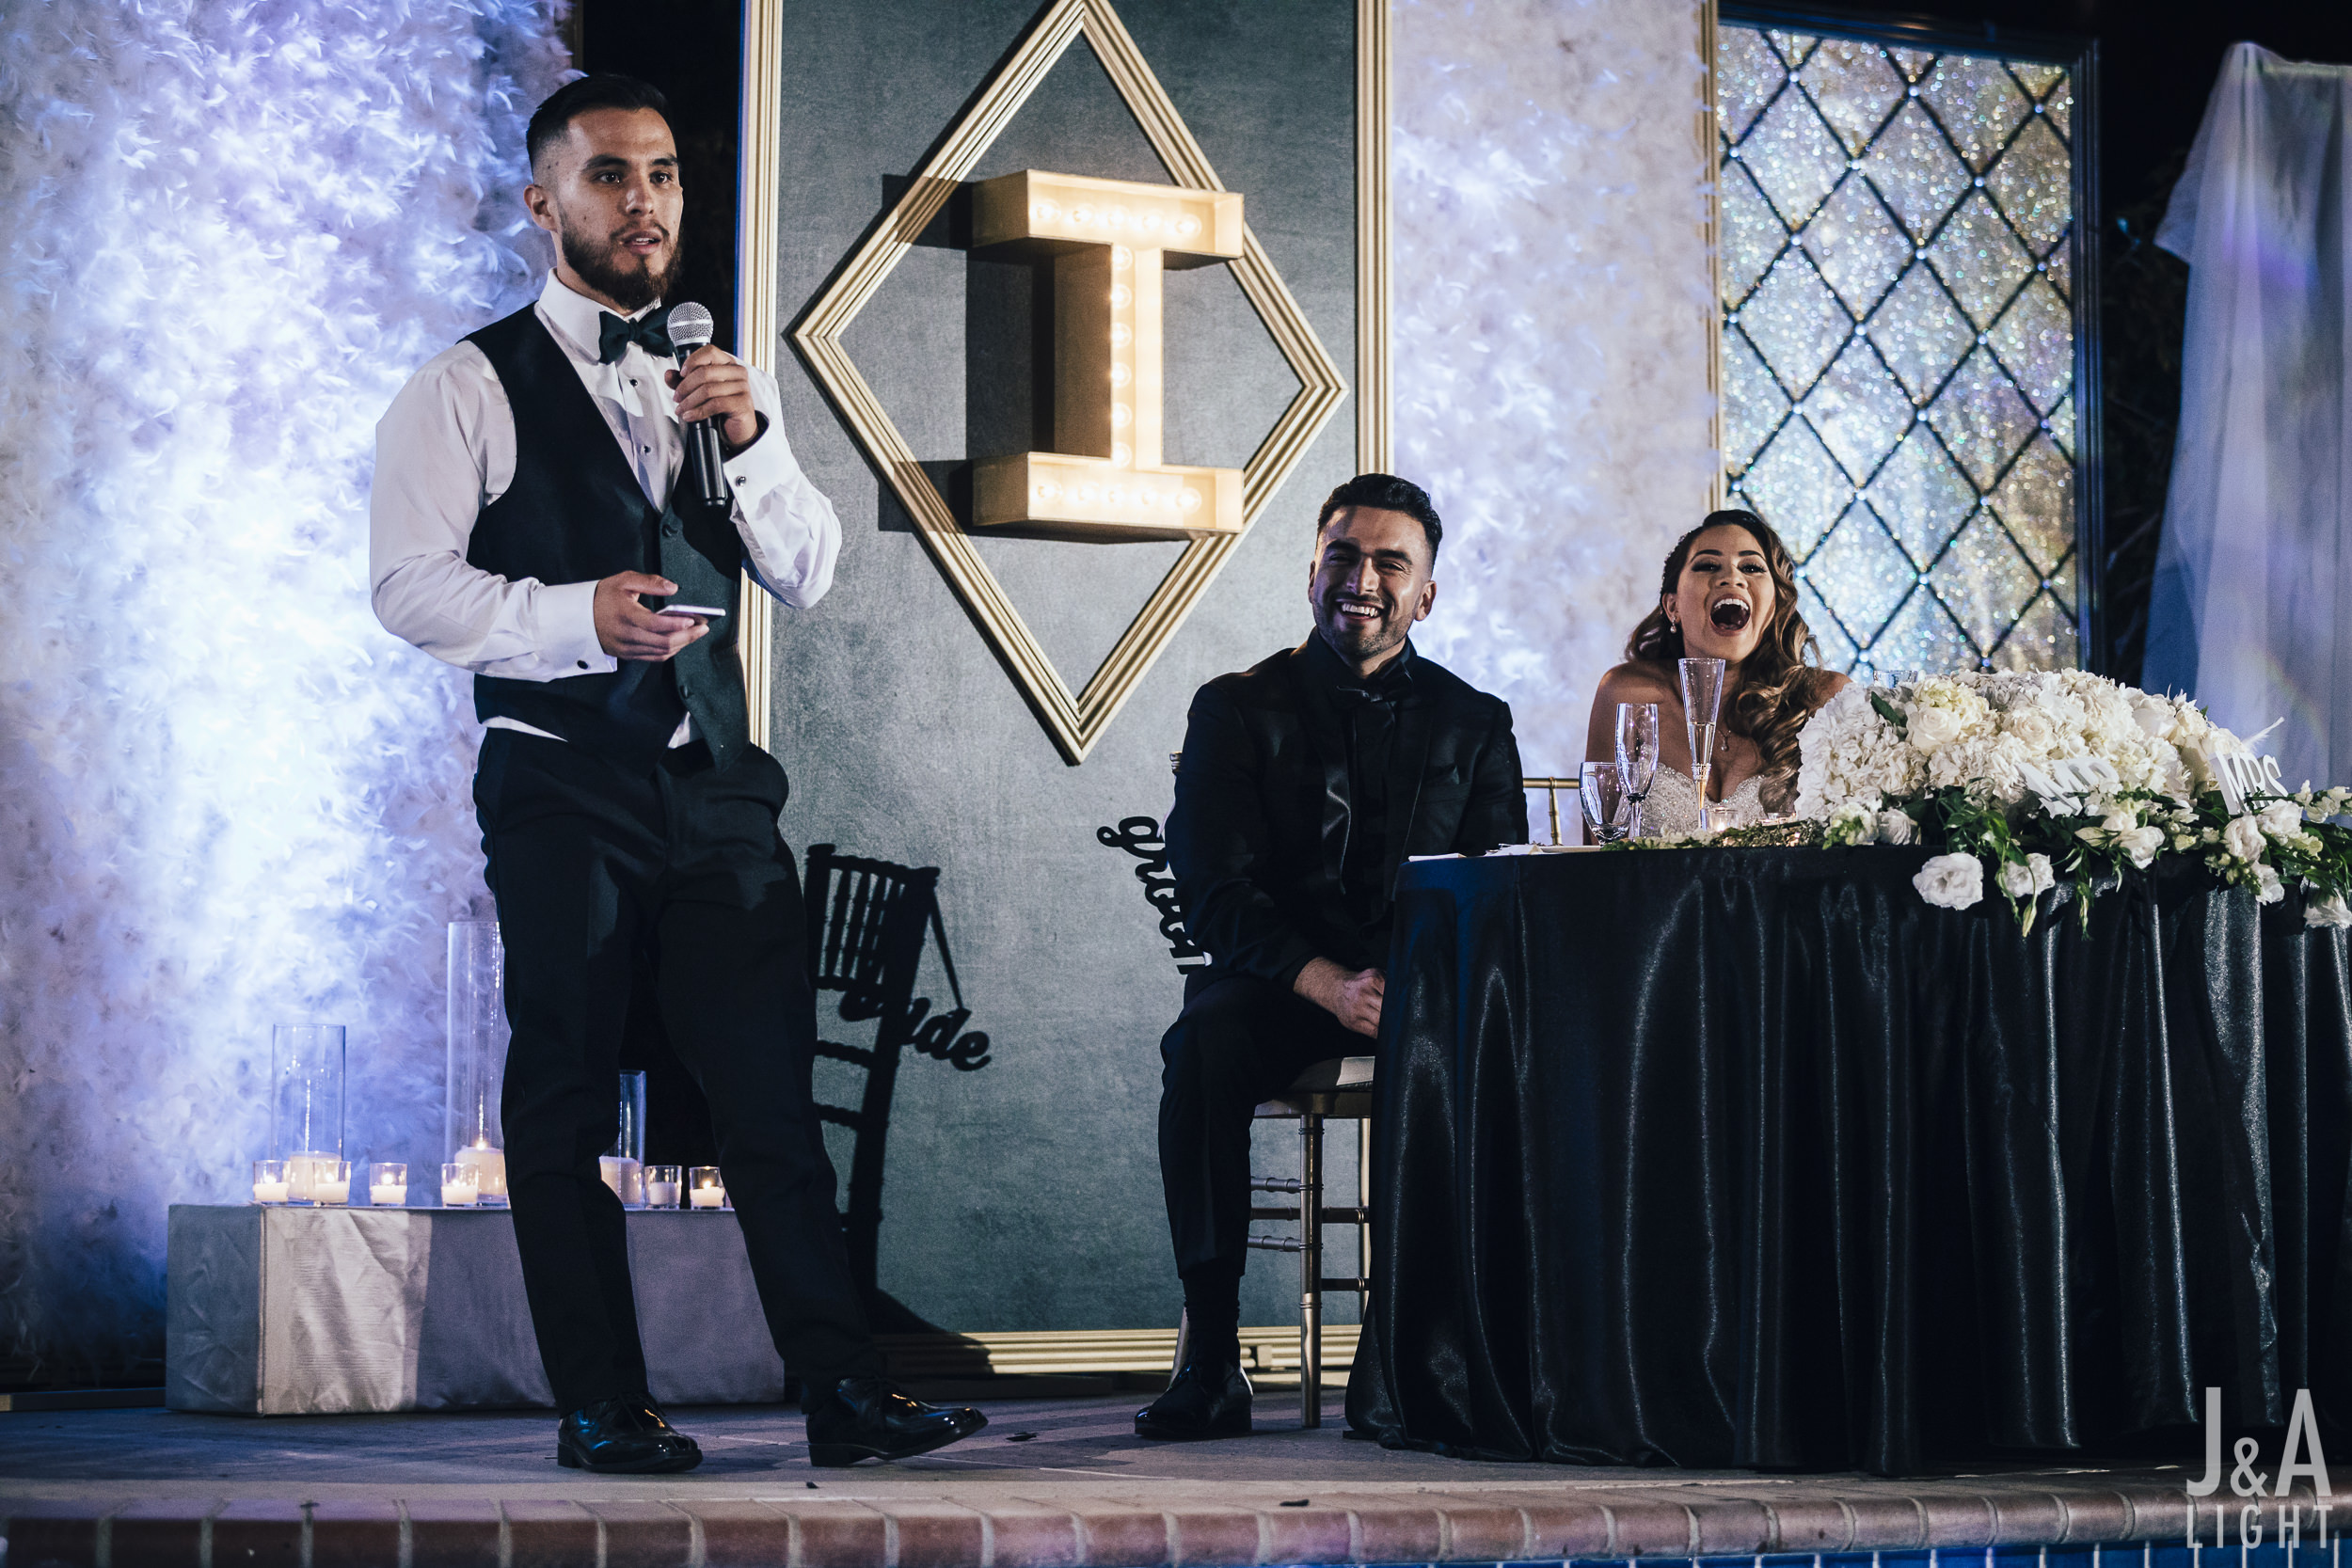 20171014-JanDan-LosBanos-GlassMansion-Wedding-Blog-076.jpg